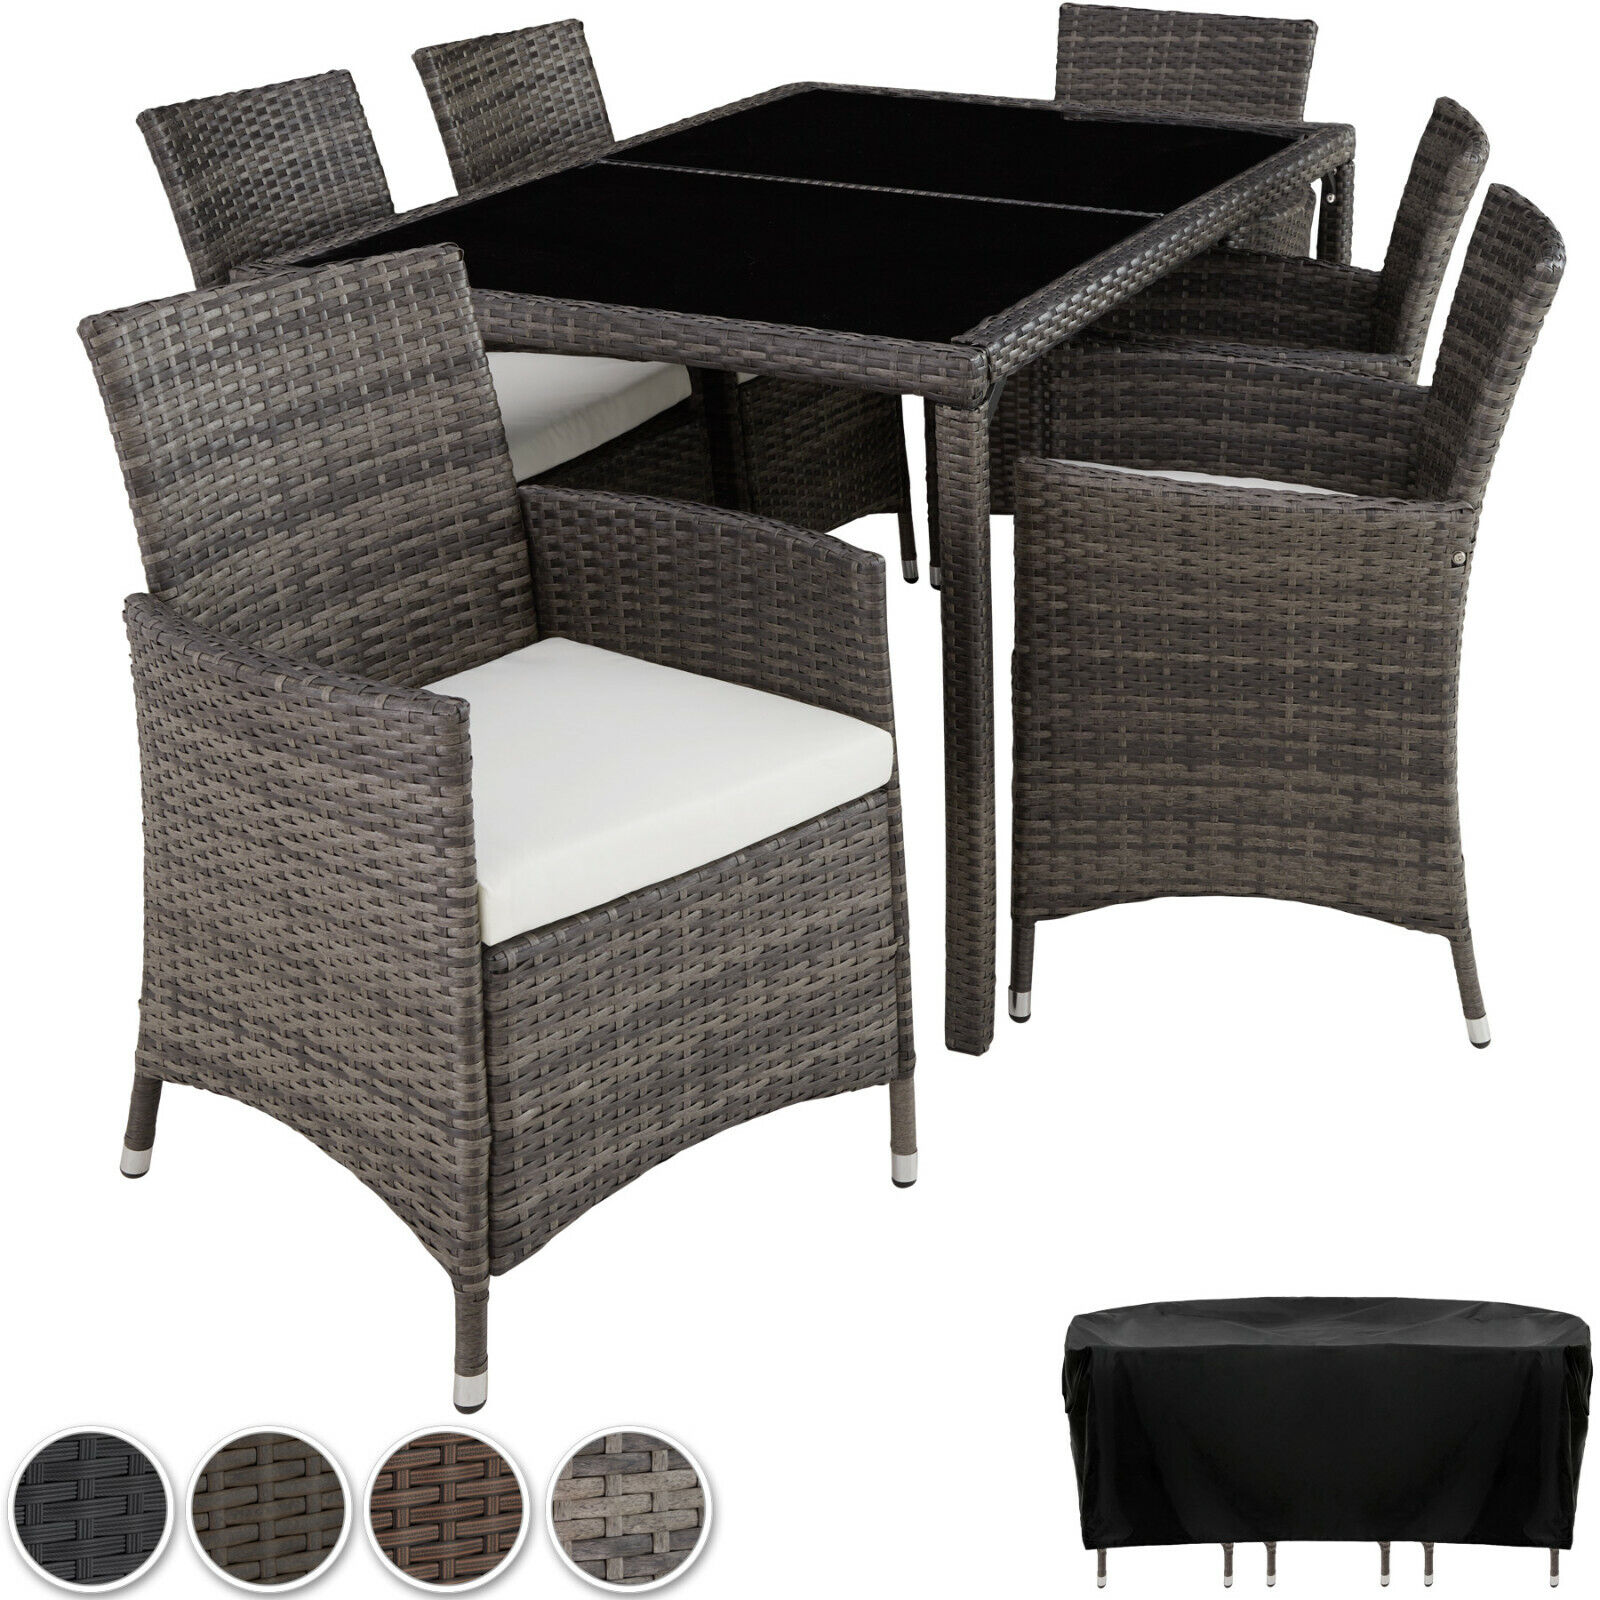 Garden Furniture - Set Rattan Garden Furniture 6 Chairs Table Dining Roomo Patio Outdoor Wicker New